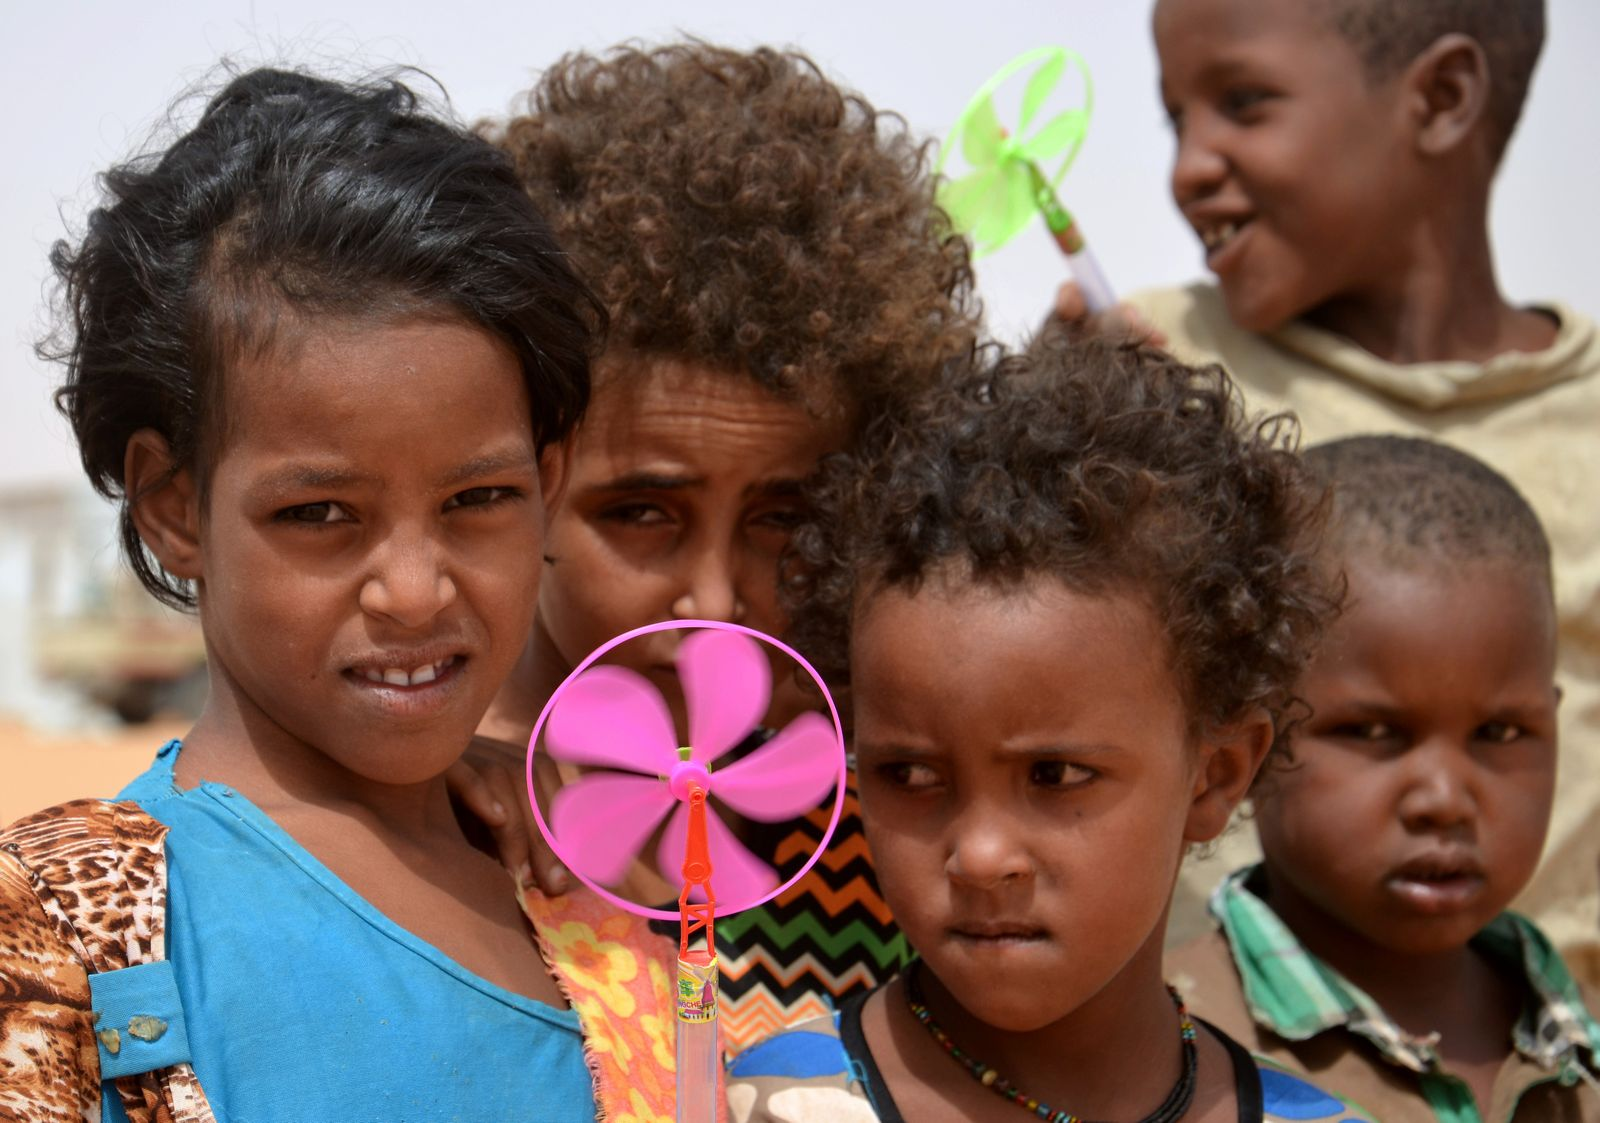 Niger/ Tahoua/ Flüchtlinge